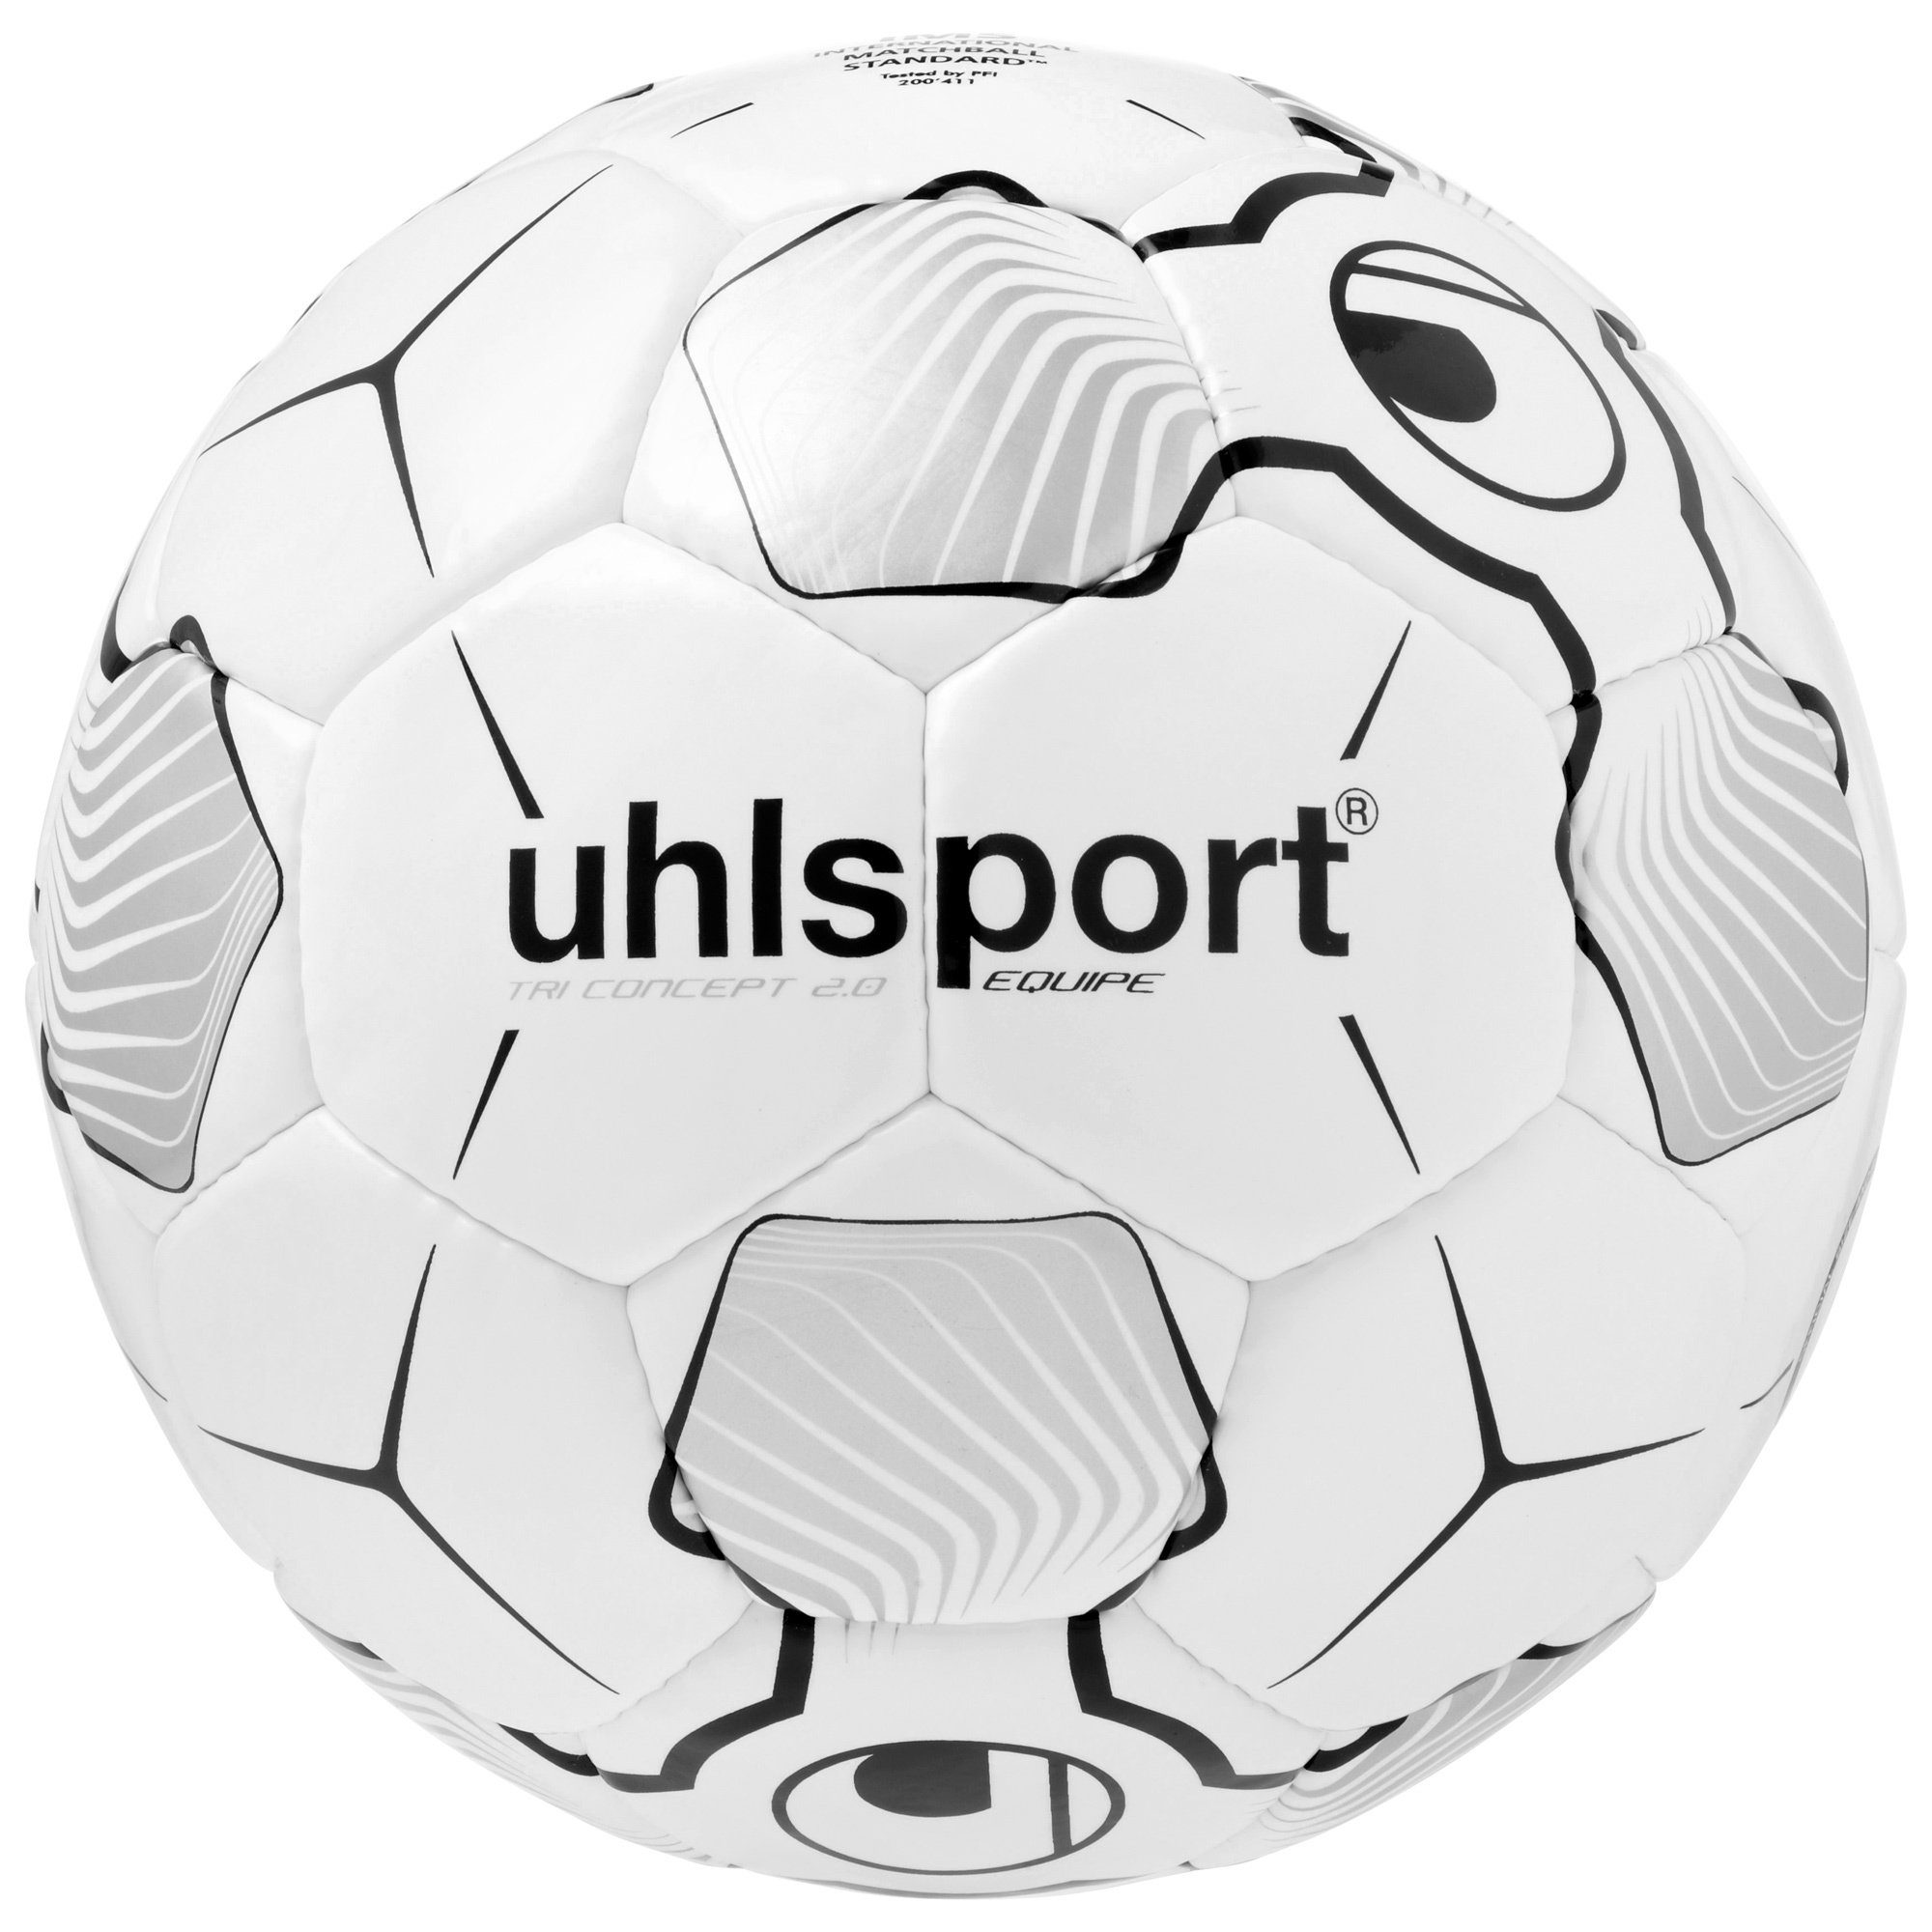 UHLSPORT Tri Concept 2.0 Equipe Fußball